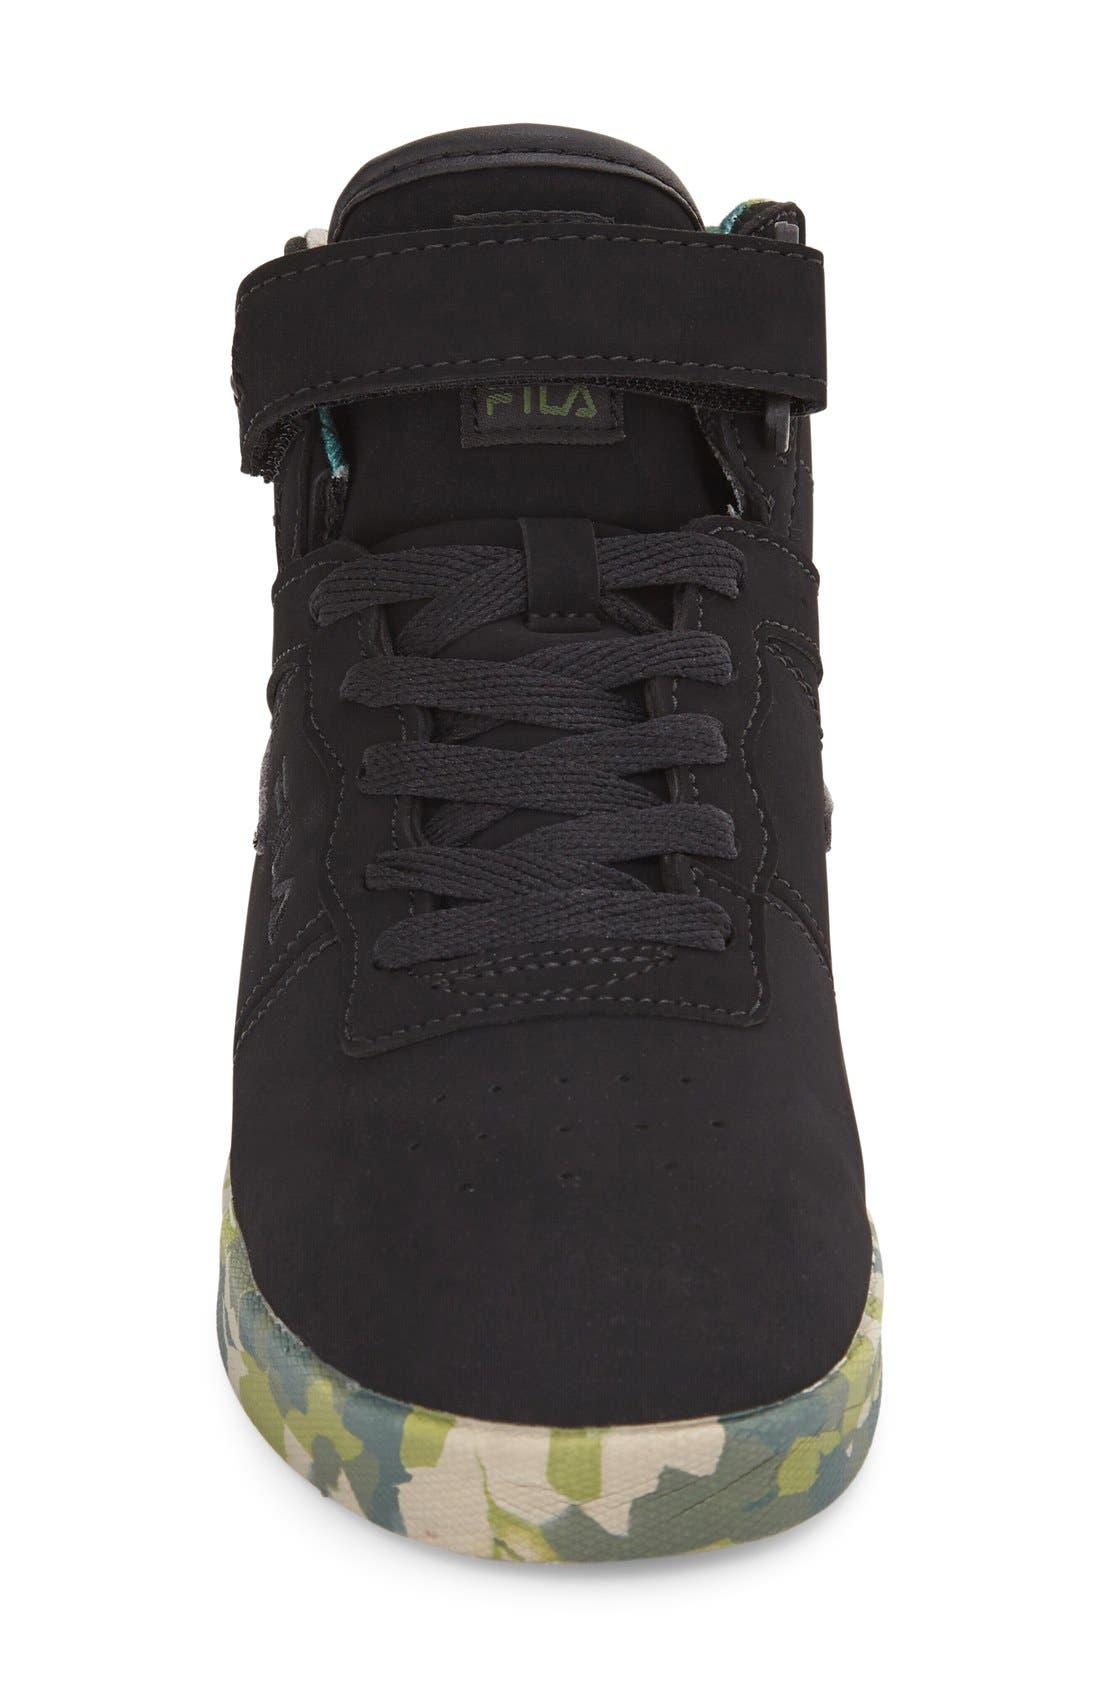 Vulc 13 Mashup High Top Sneaker,                             Alternate thumbnail 3, color,                             001